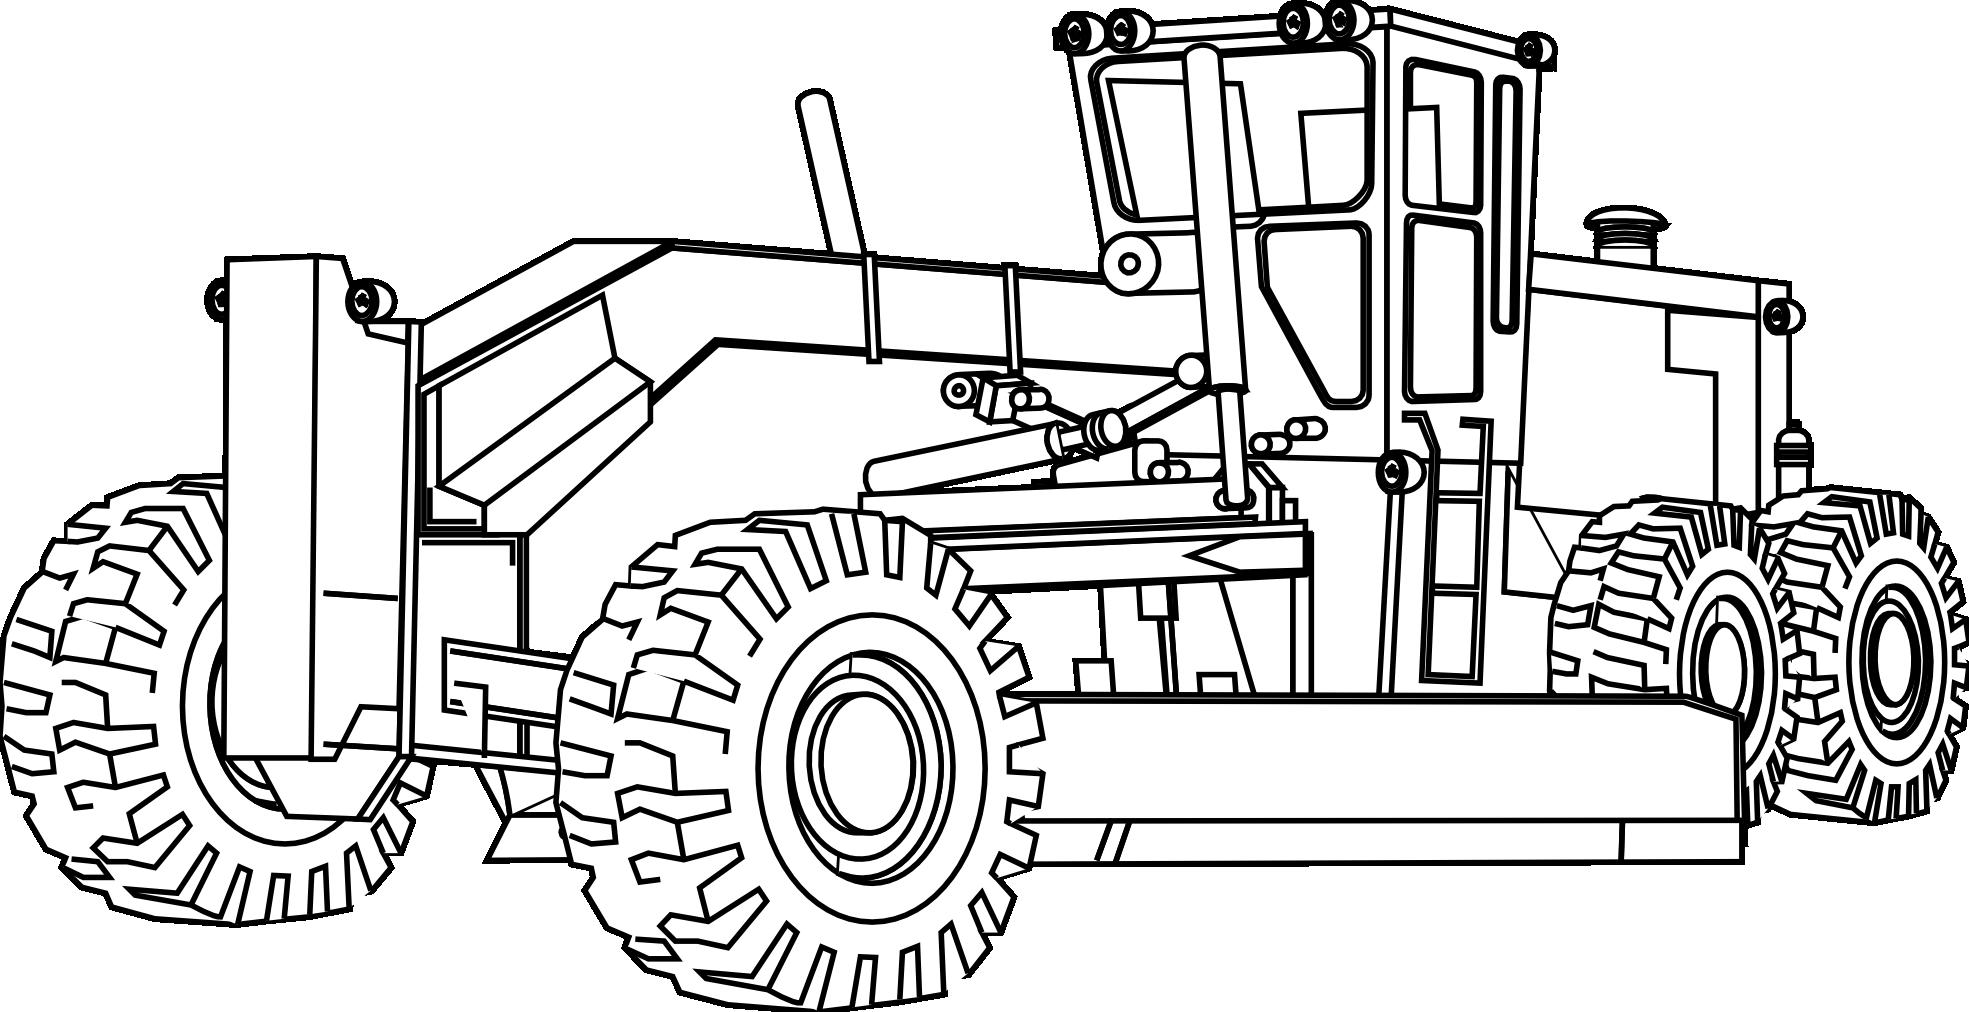 Printable Pictures Of Construction Equipment Artfavor Heavy